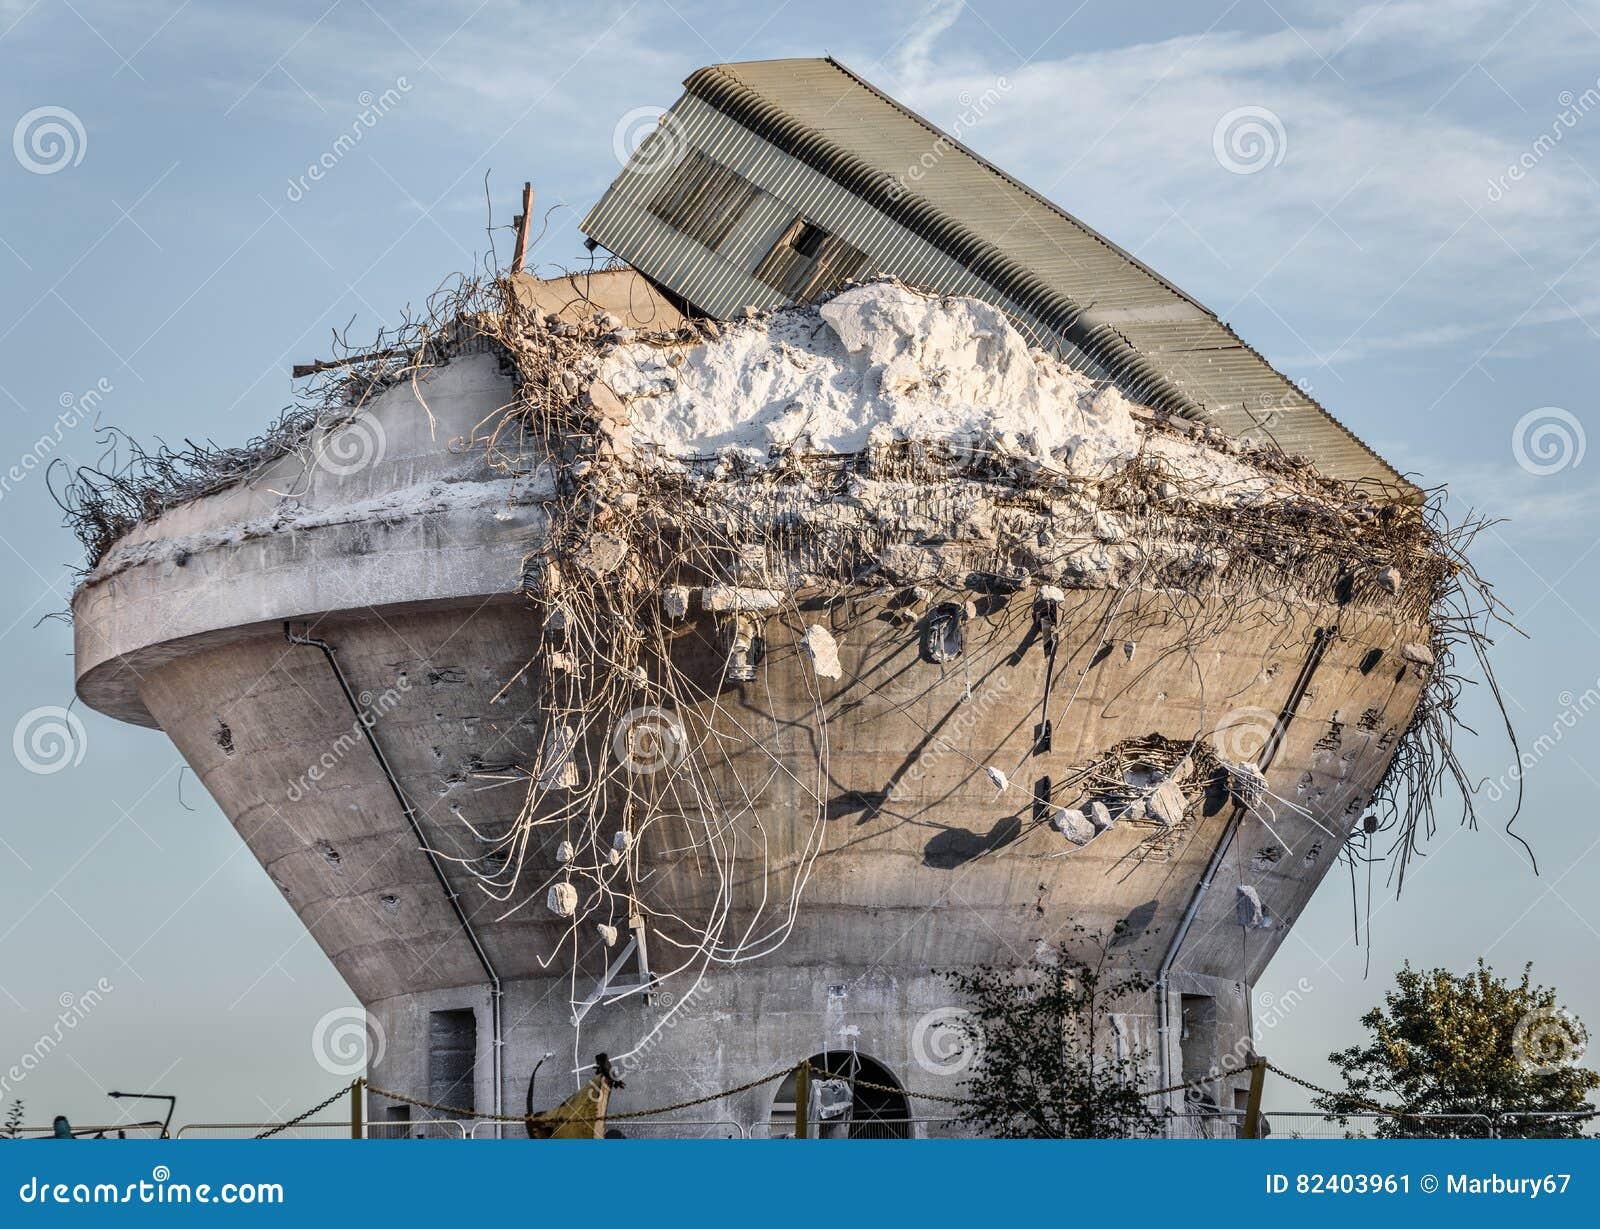 Industriell katastrof